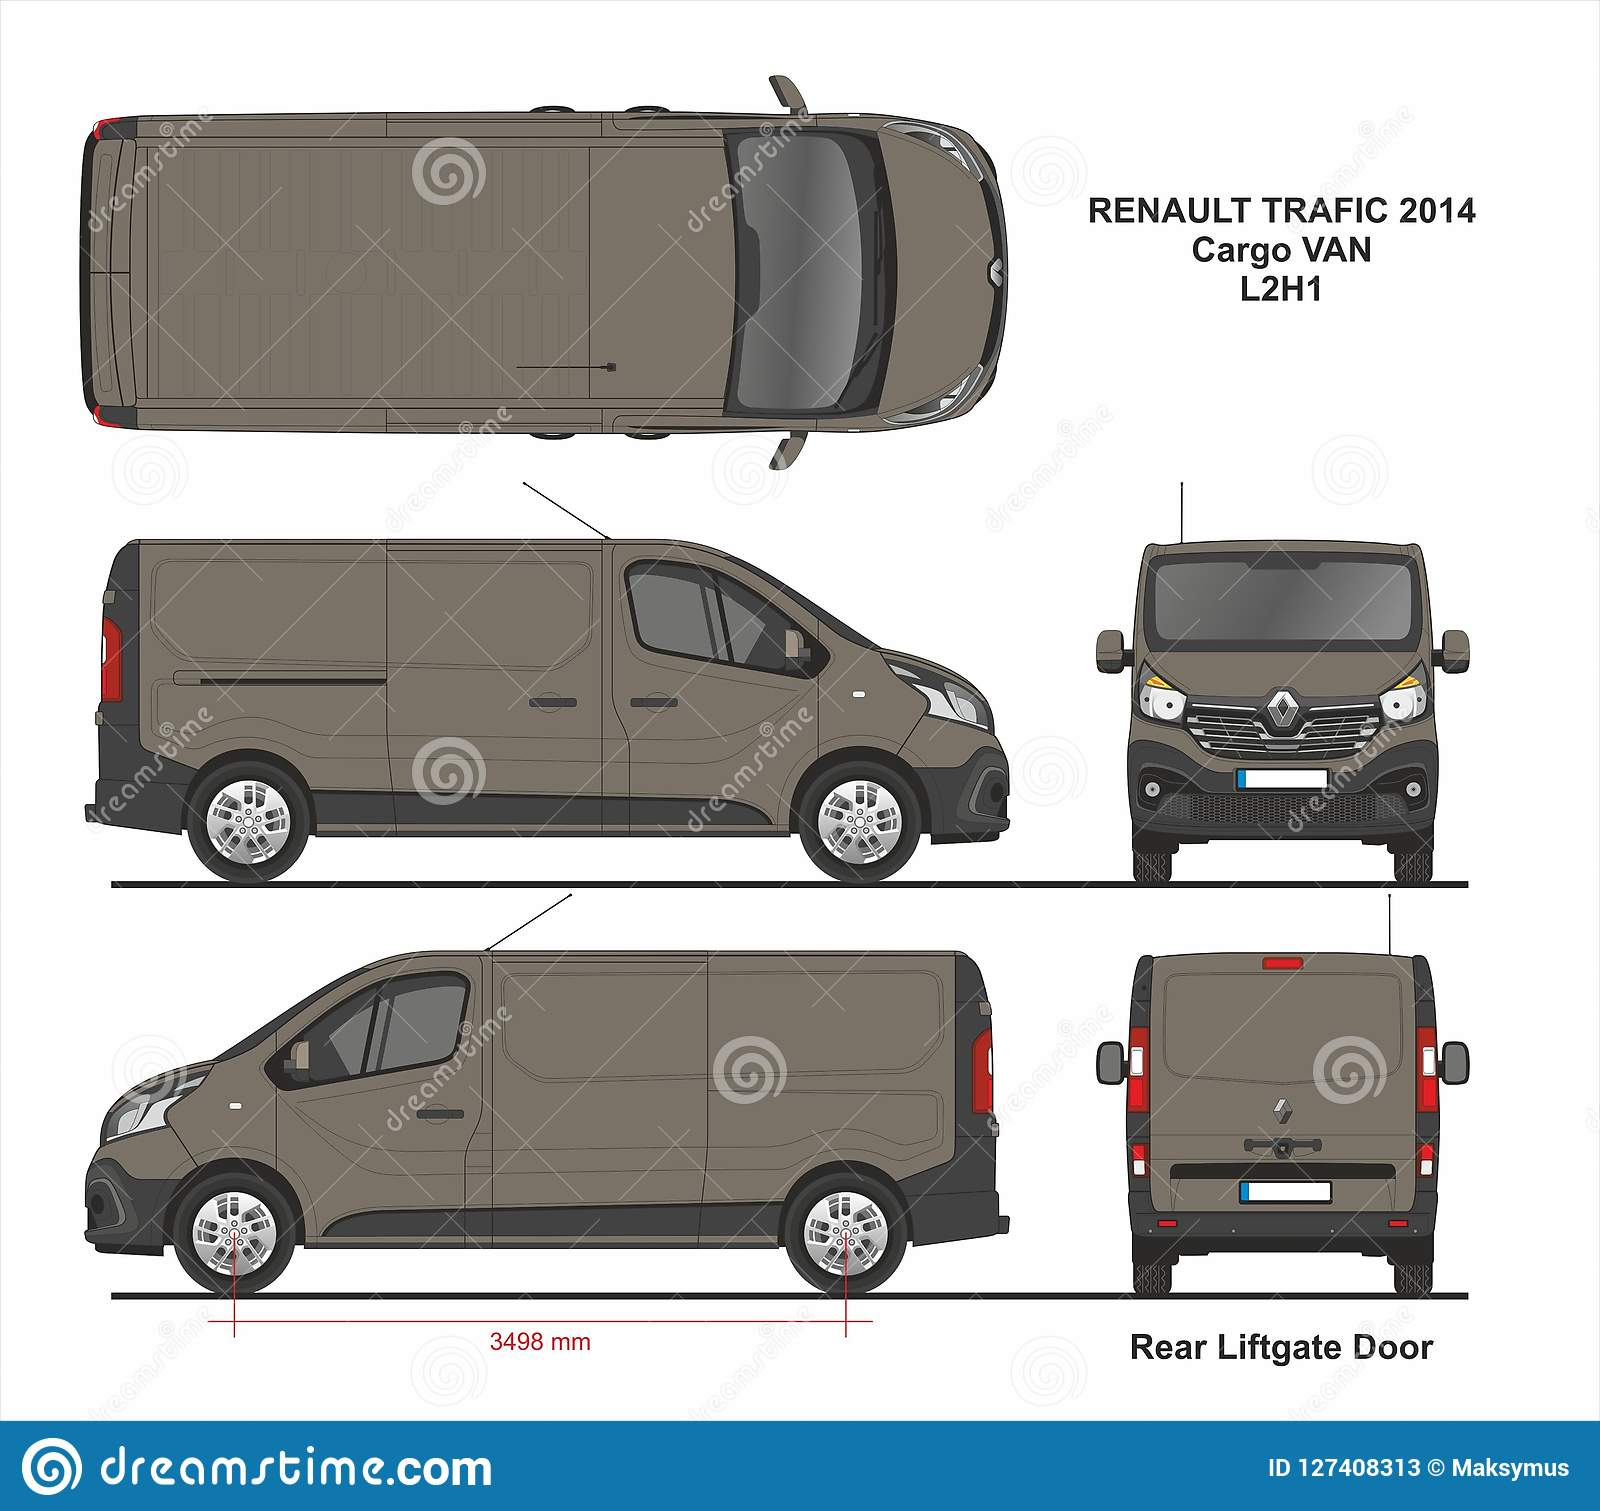 Renault Trafic Van Gvw: Renault Trafic Cargo Delivery Van L2H1 2014 Photo Stock